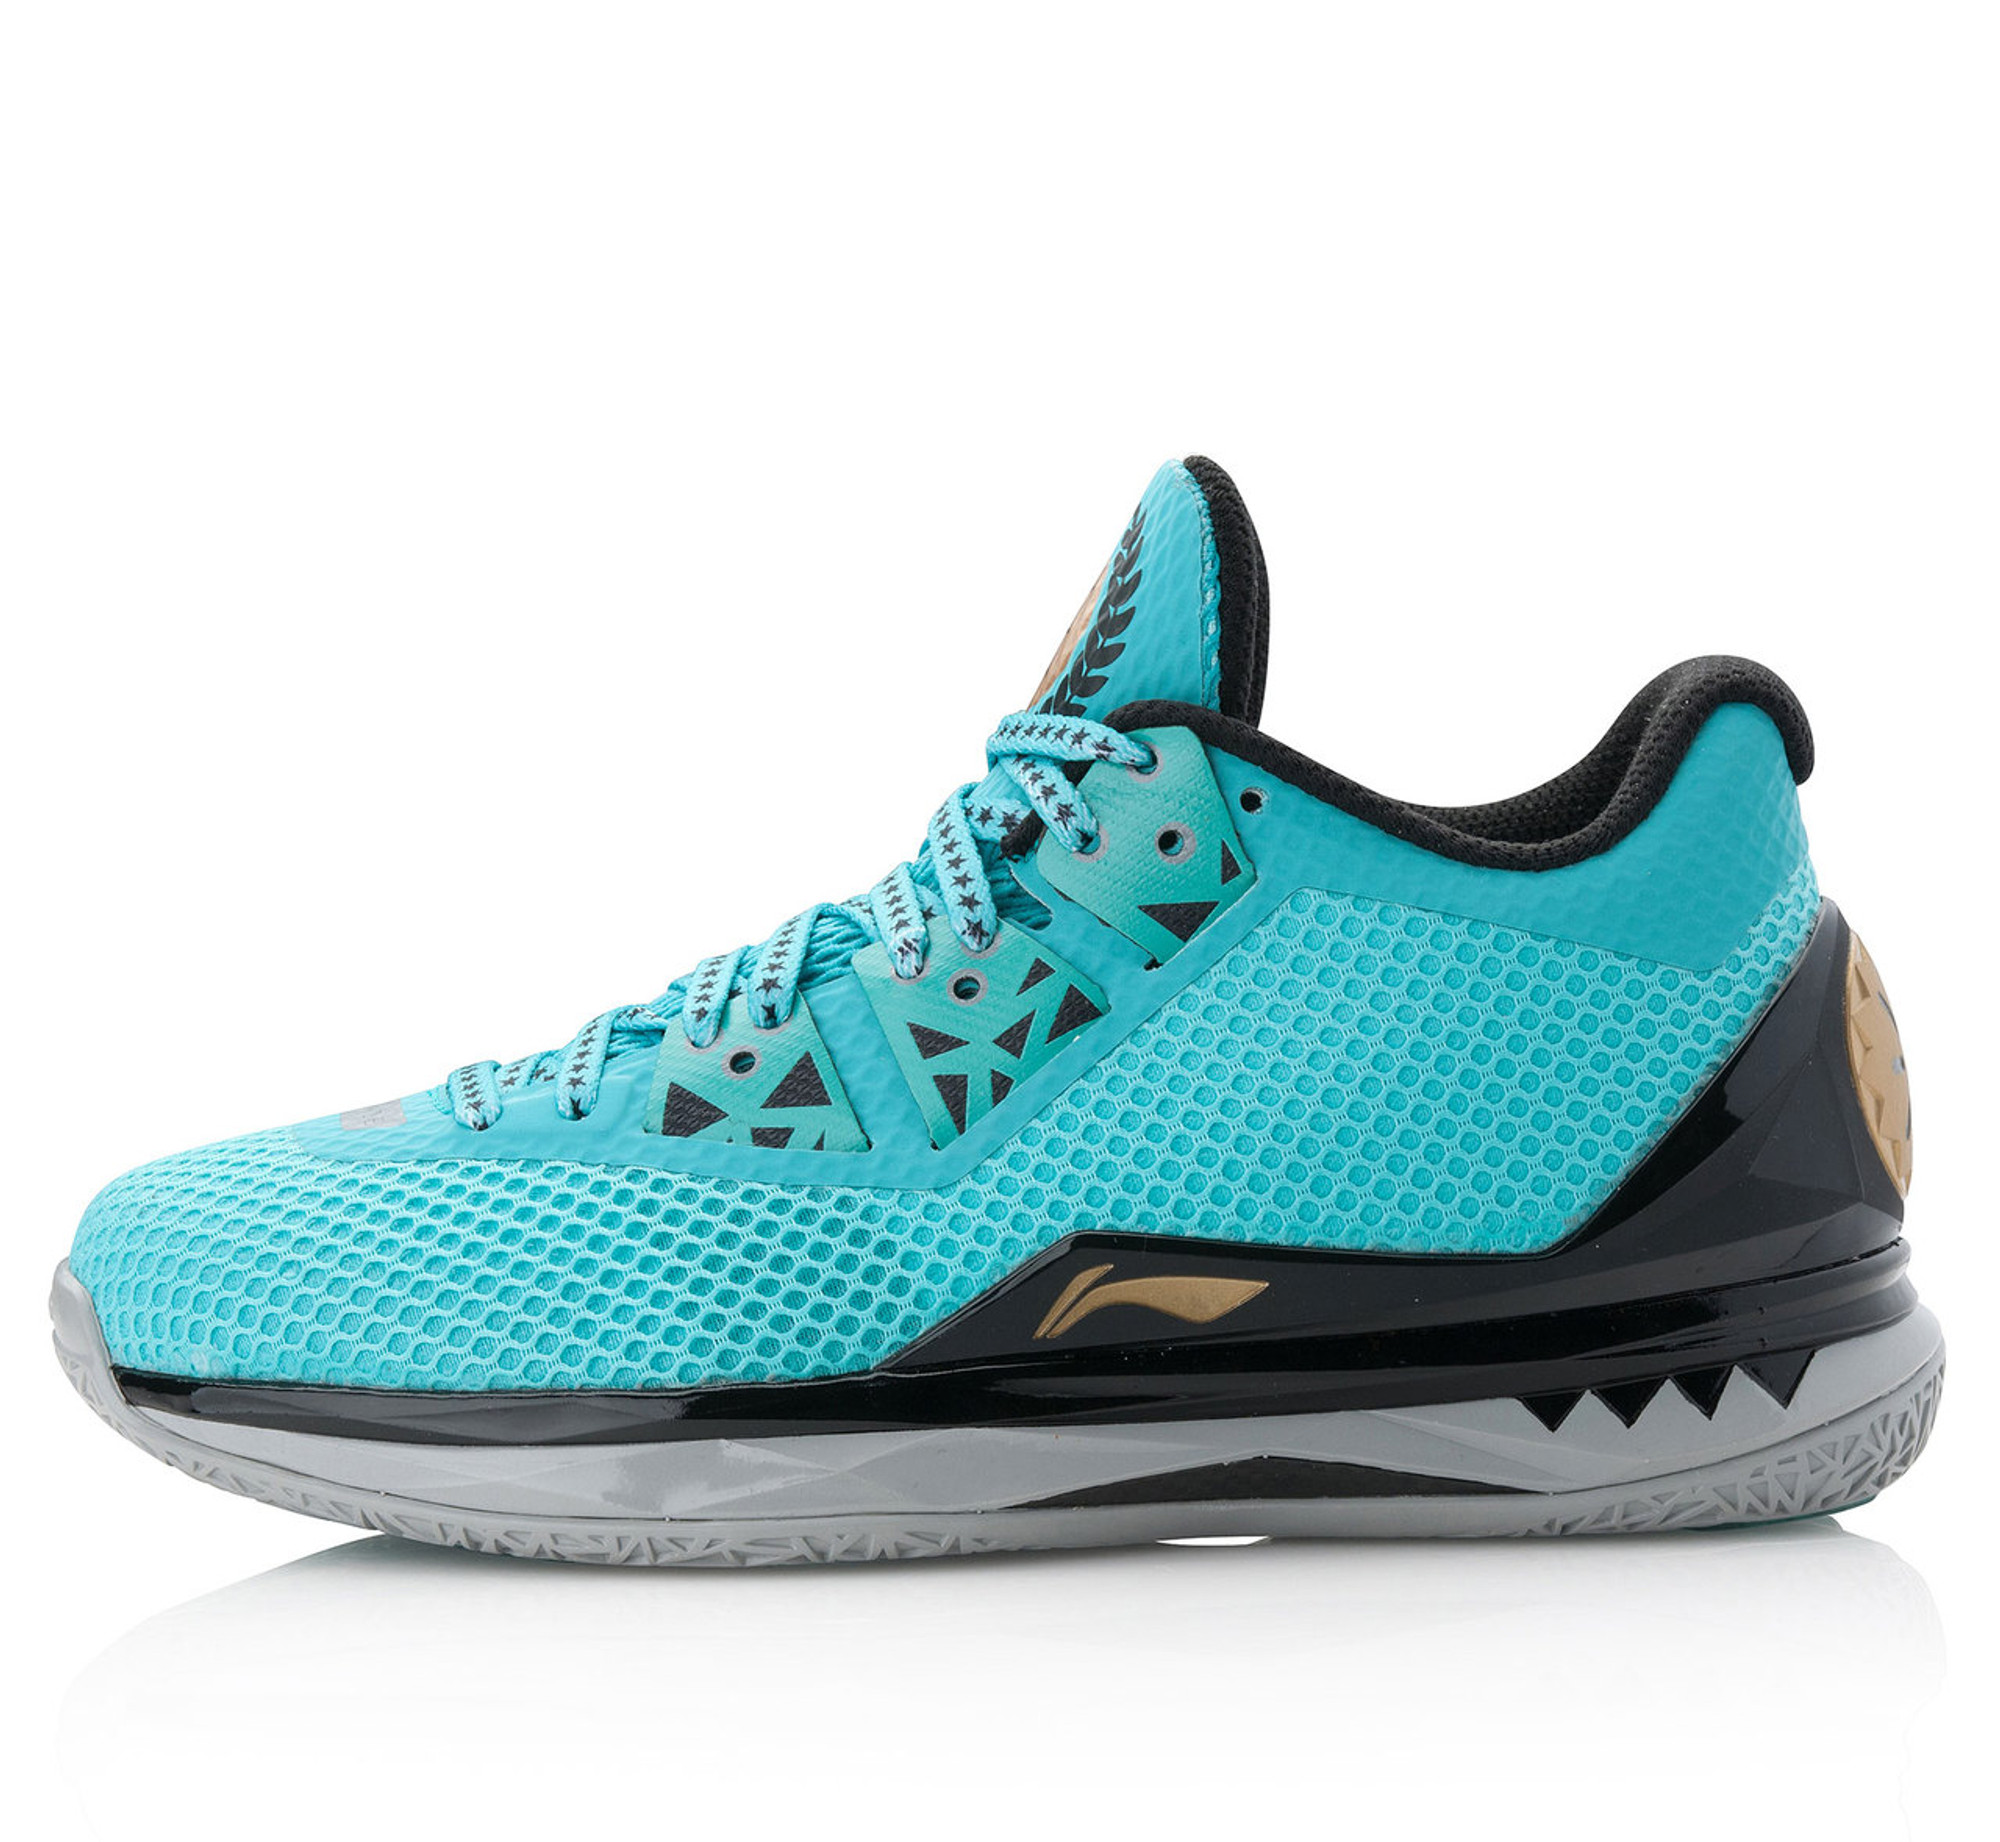 Li Ning Shoes Australia